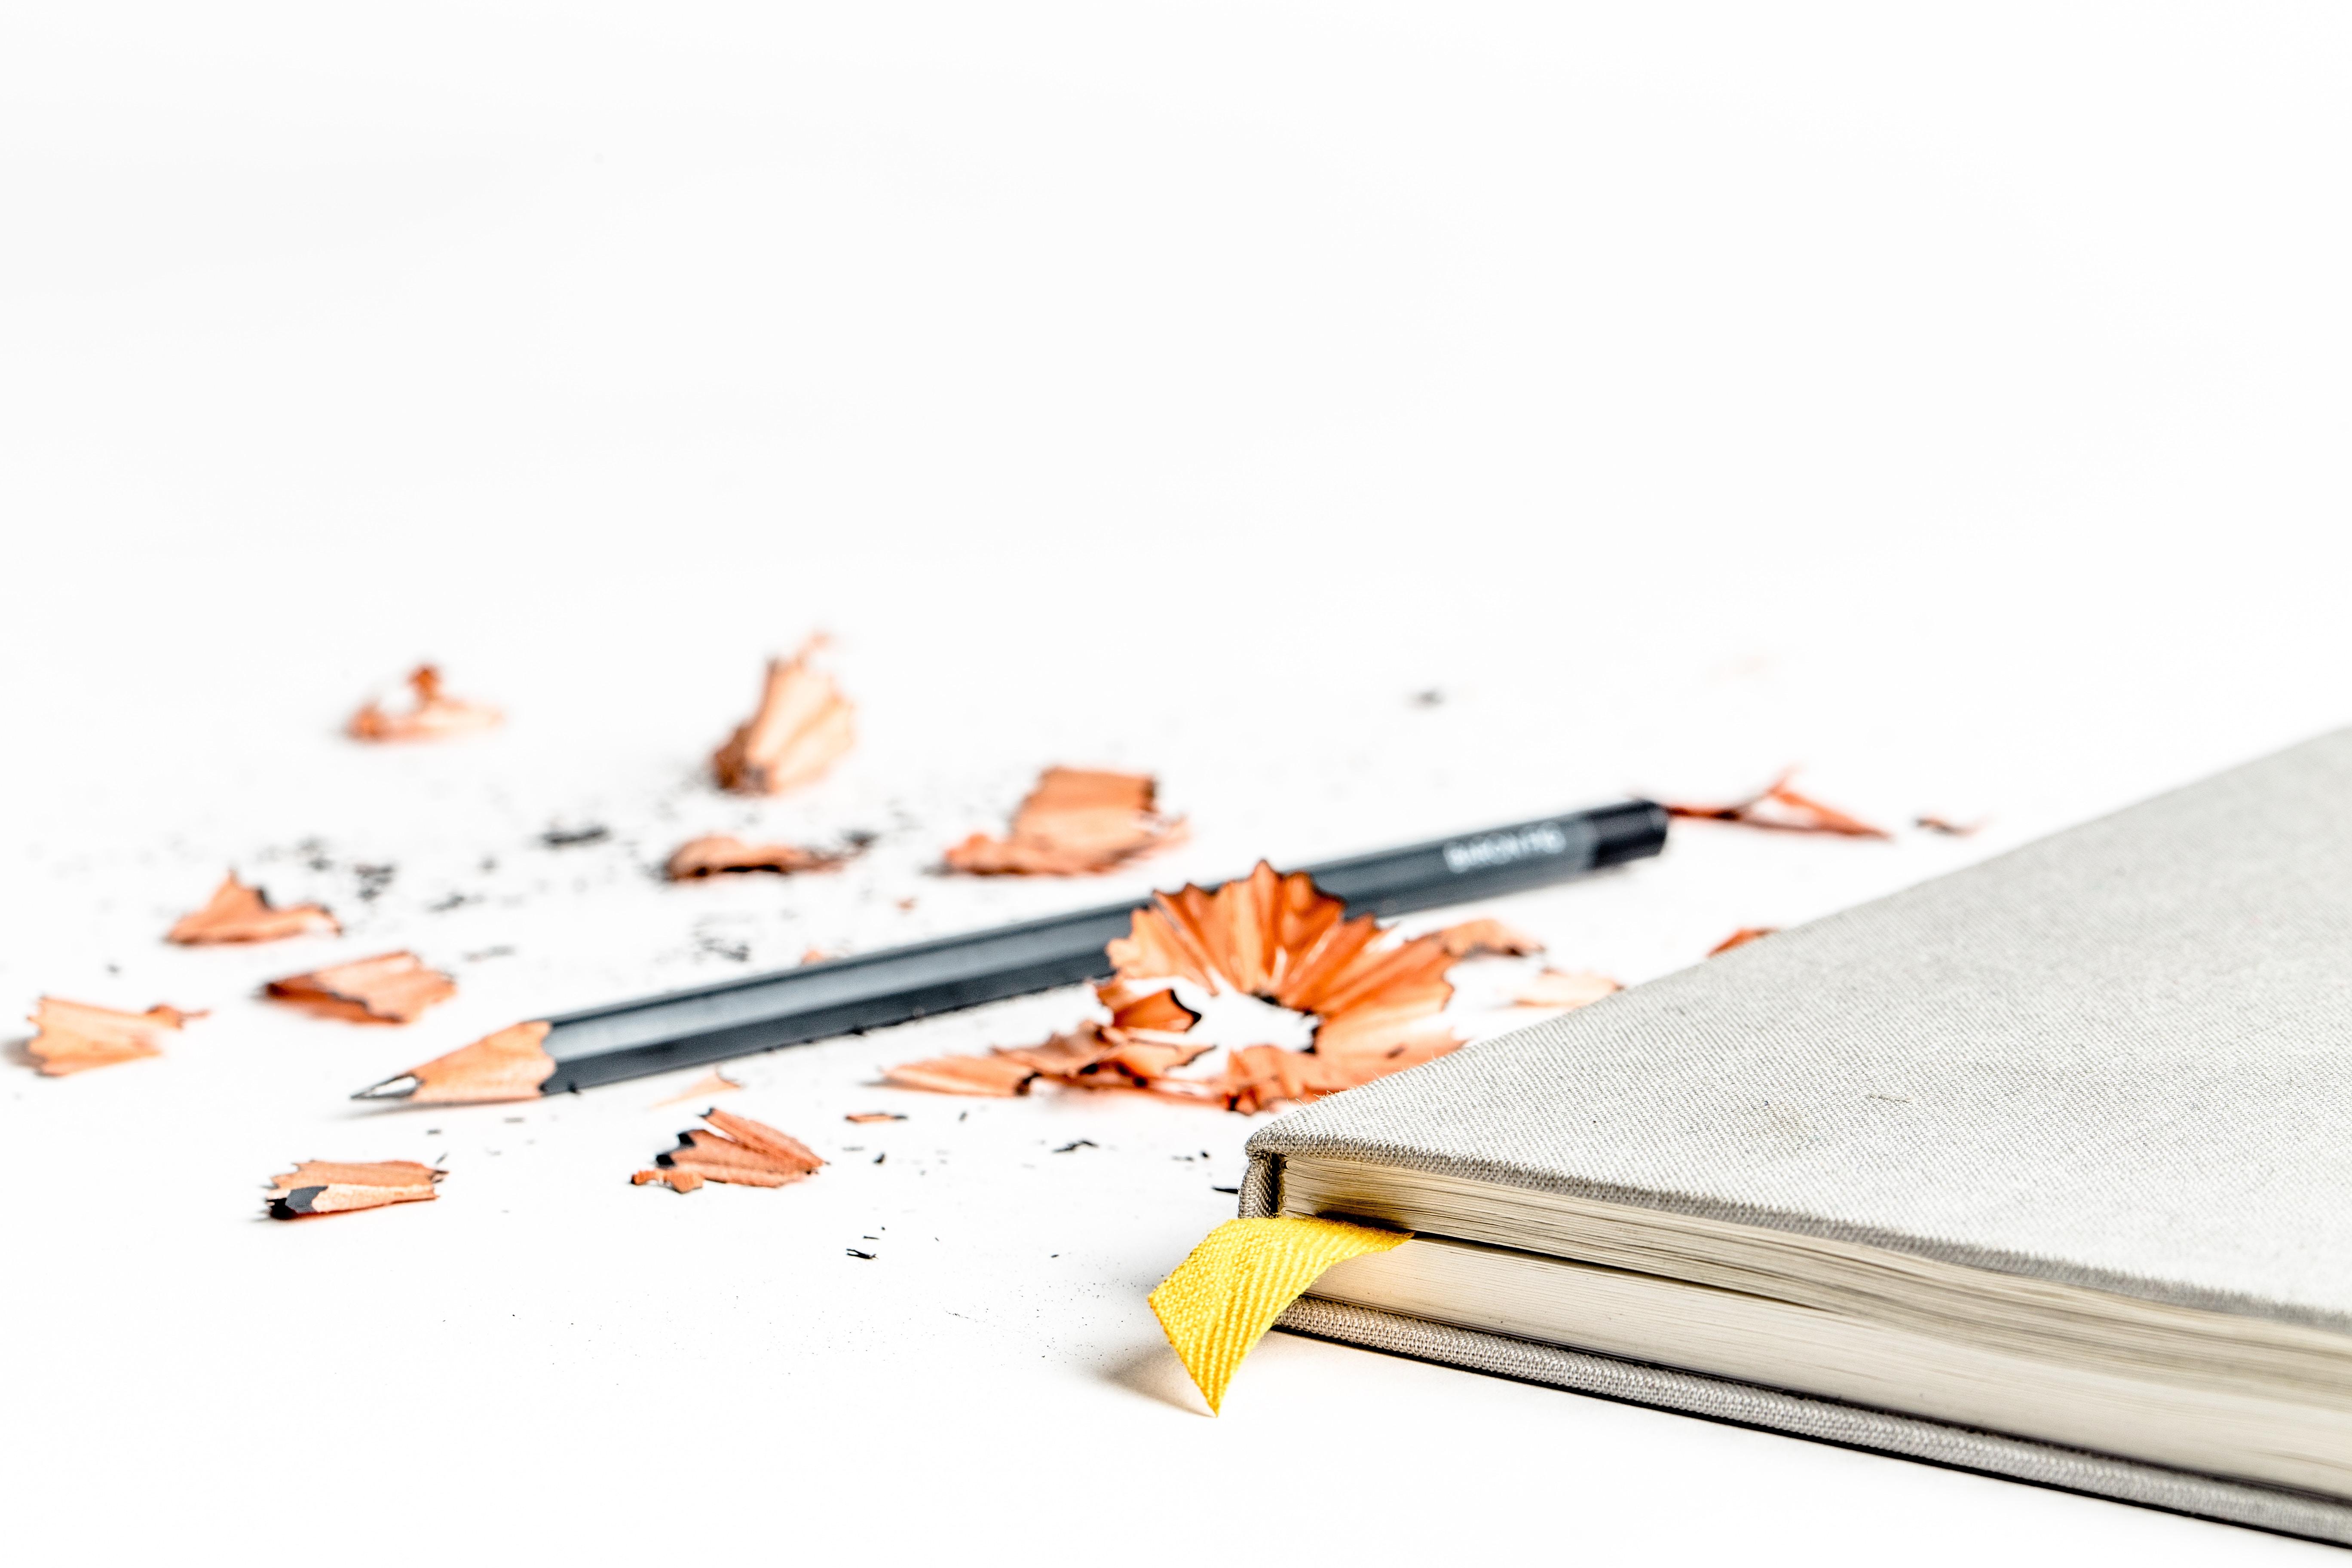 sharpened pencil near book